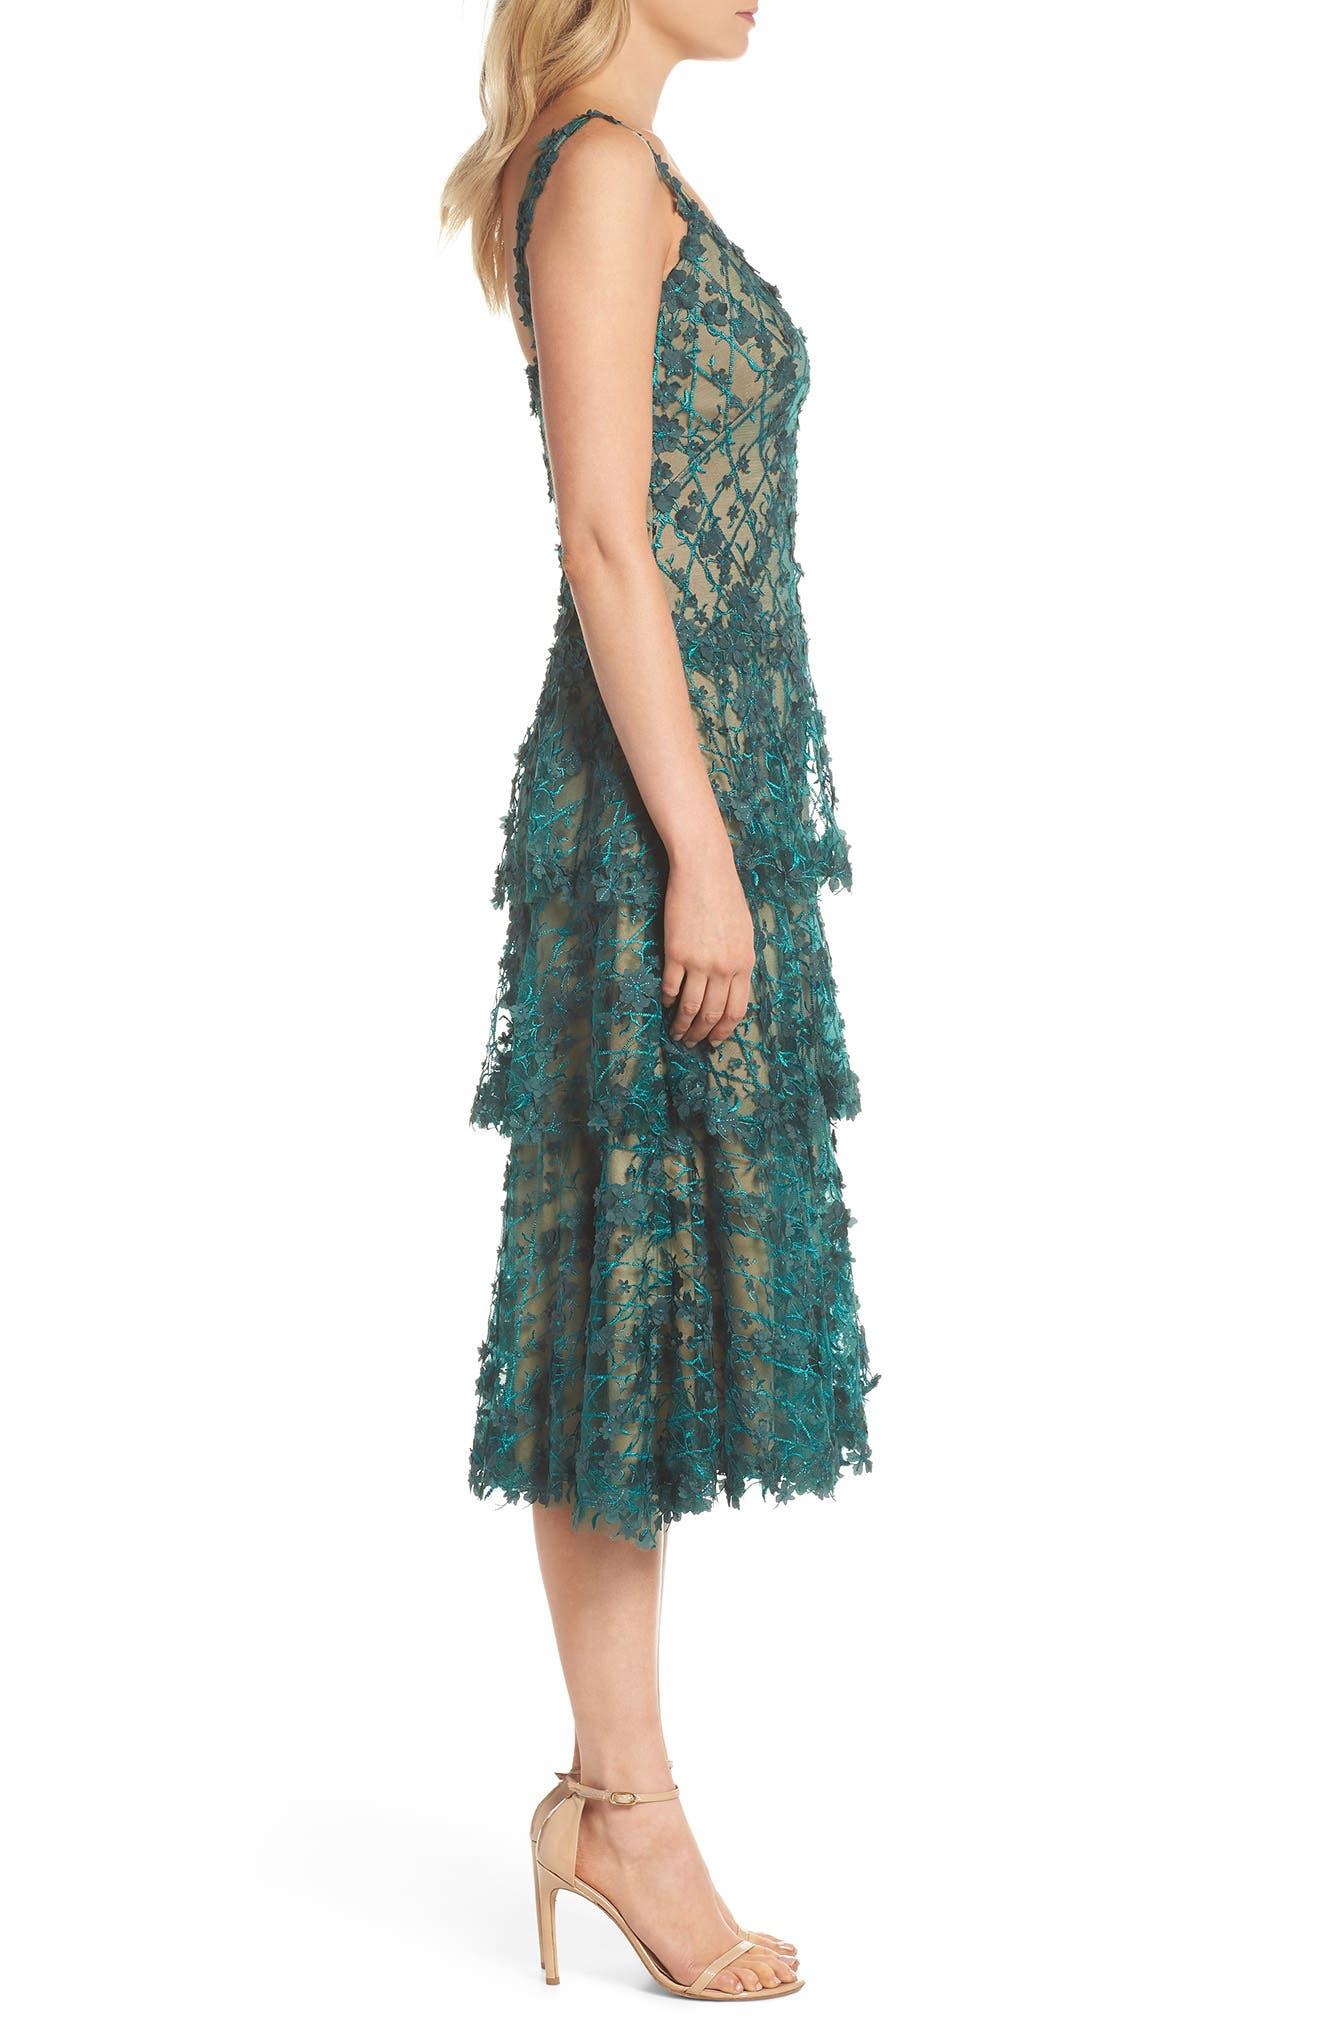 3D Floral Midi Dress,                             Alternate thumbnail 3, color,                             PINE/ NUDE